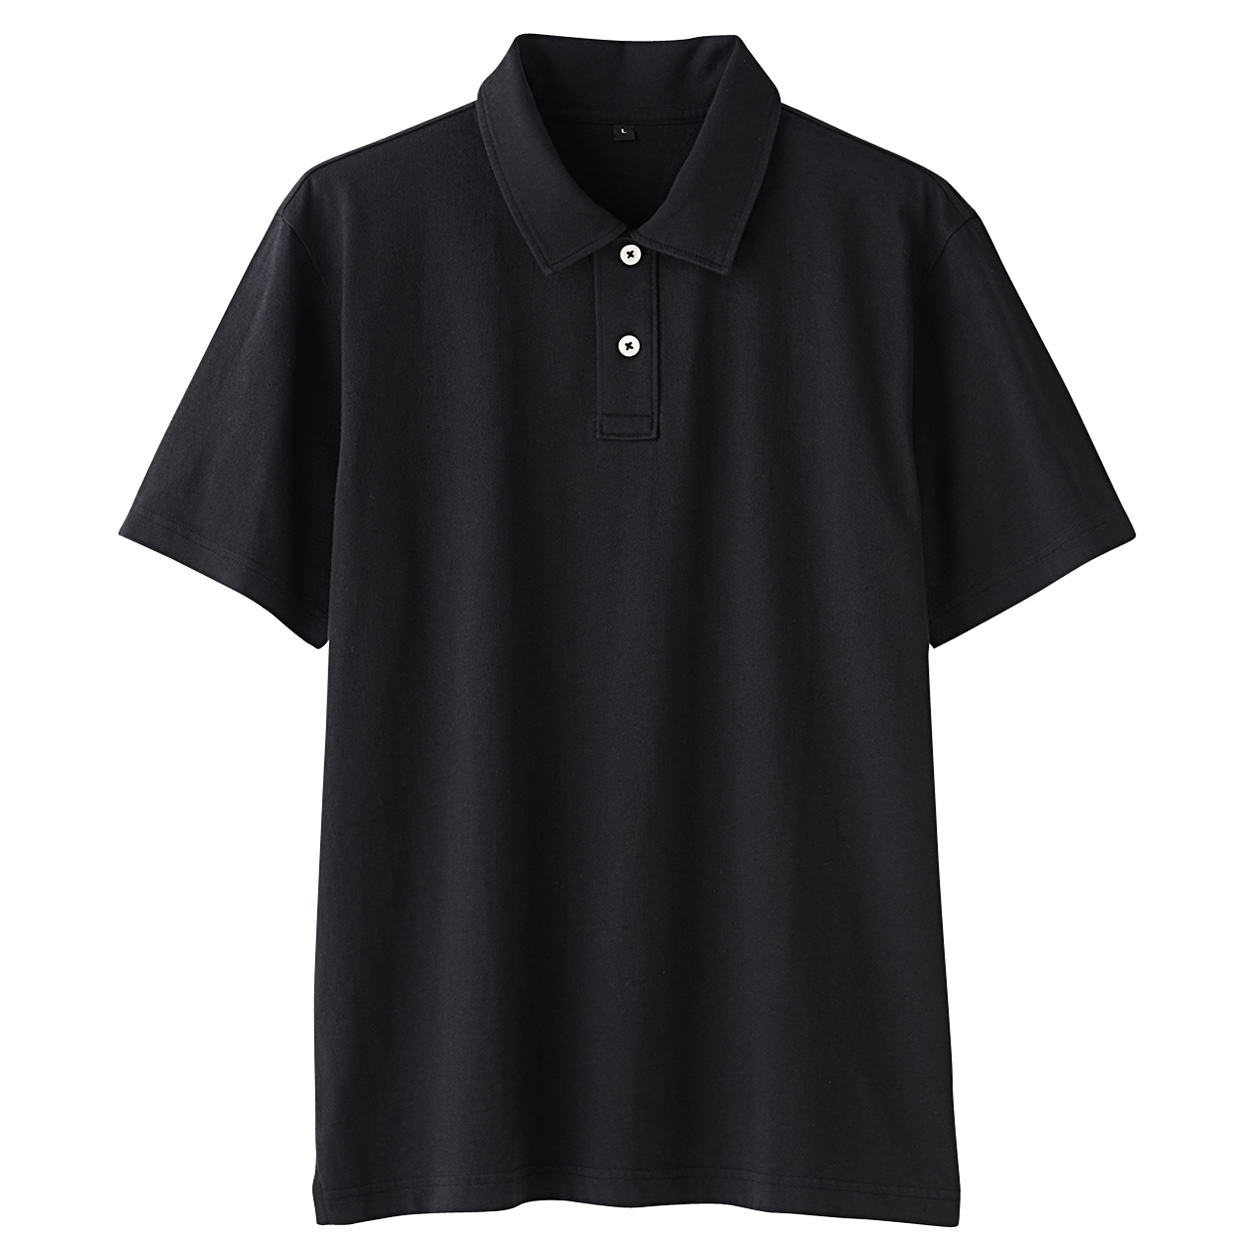 ogc plain stitch polo shirt men xl black muji. Black Bedroom Furniture Sets. Home Design Ideas